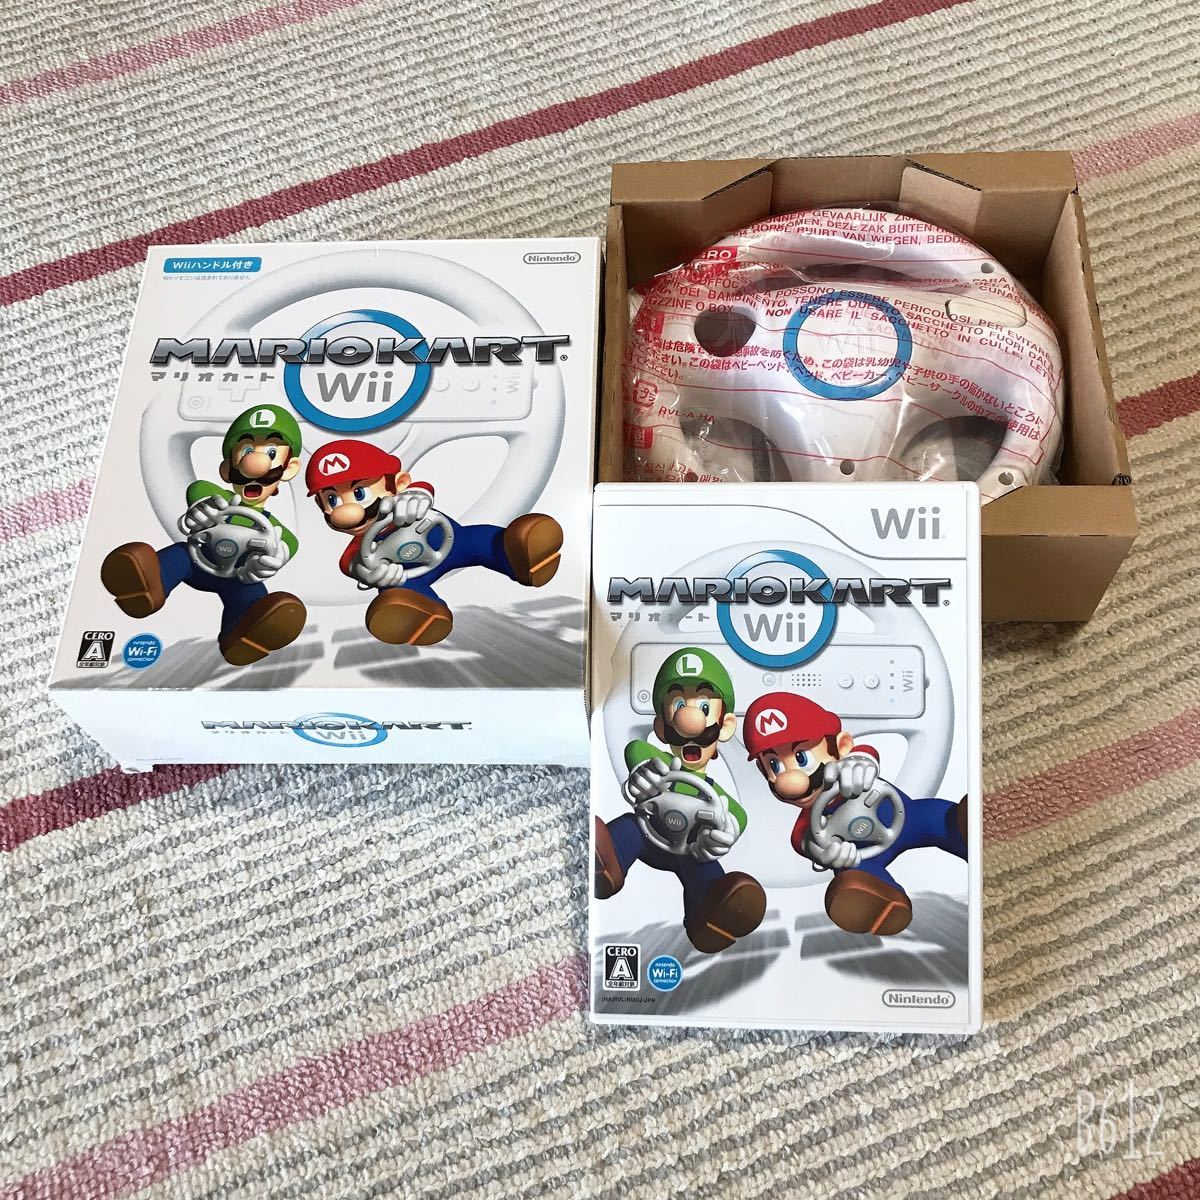 Wii本体セットWiiスポーツリゾートセット+マリオカートソフト(ハンドル2つ)